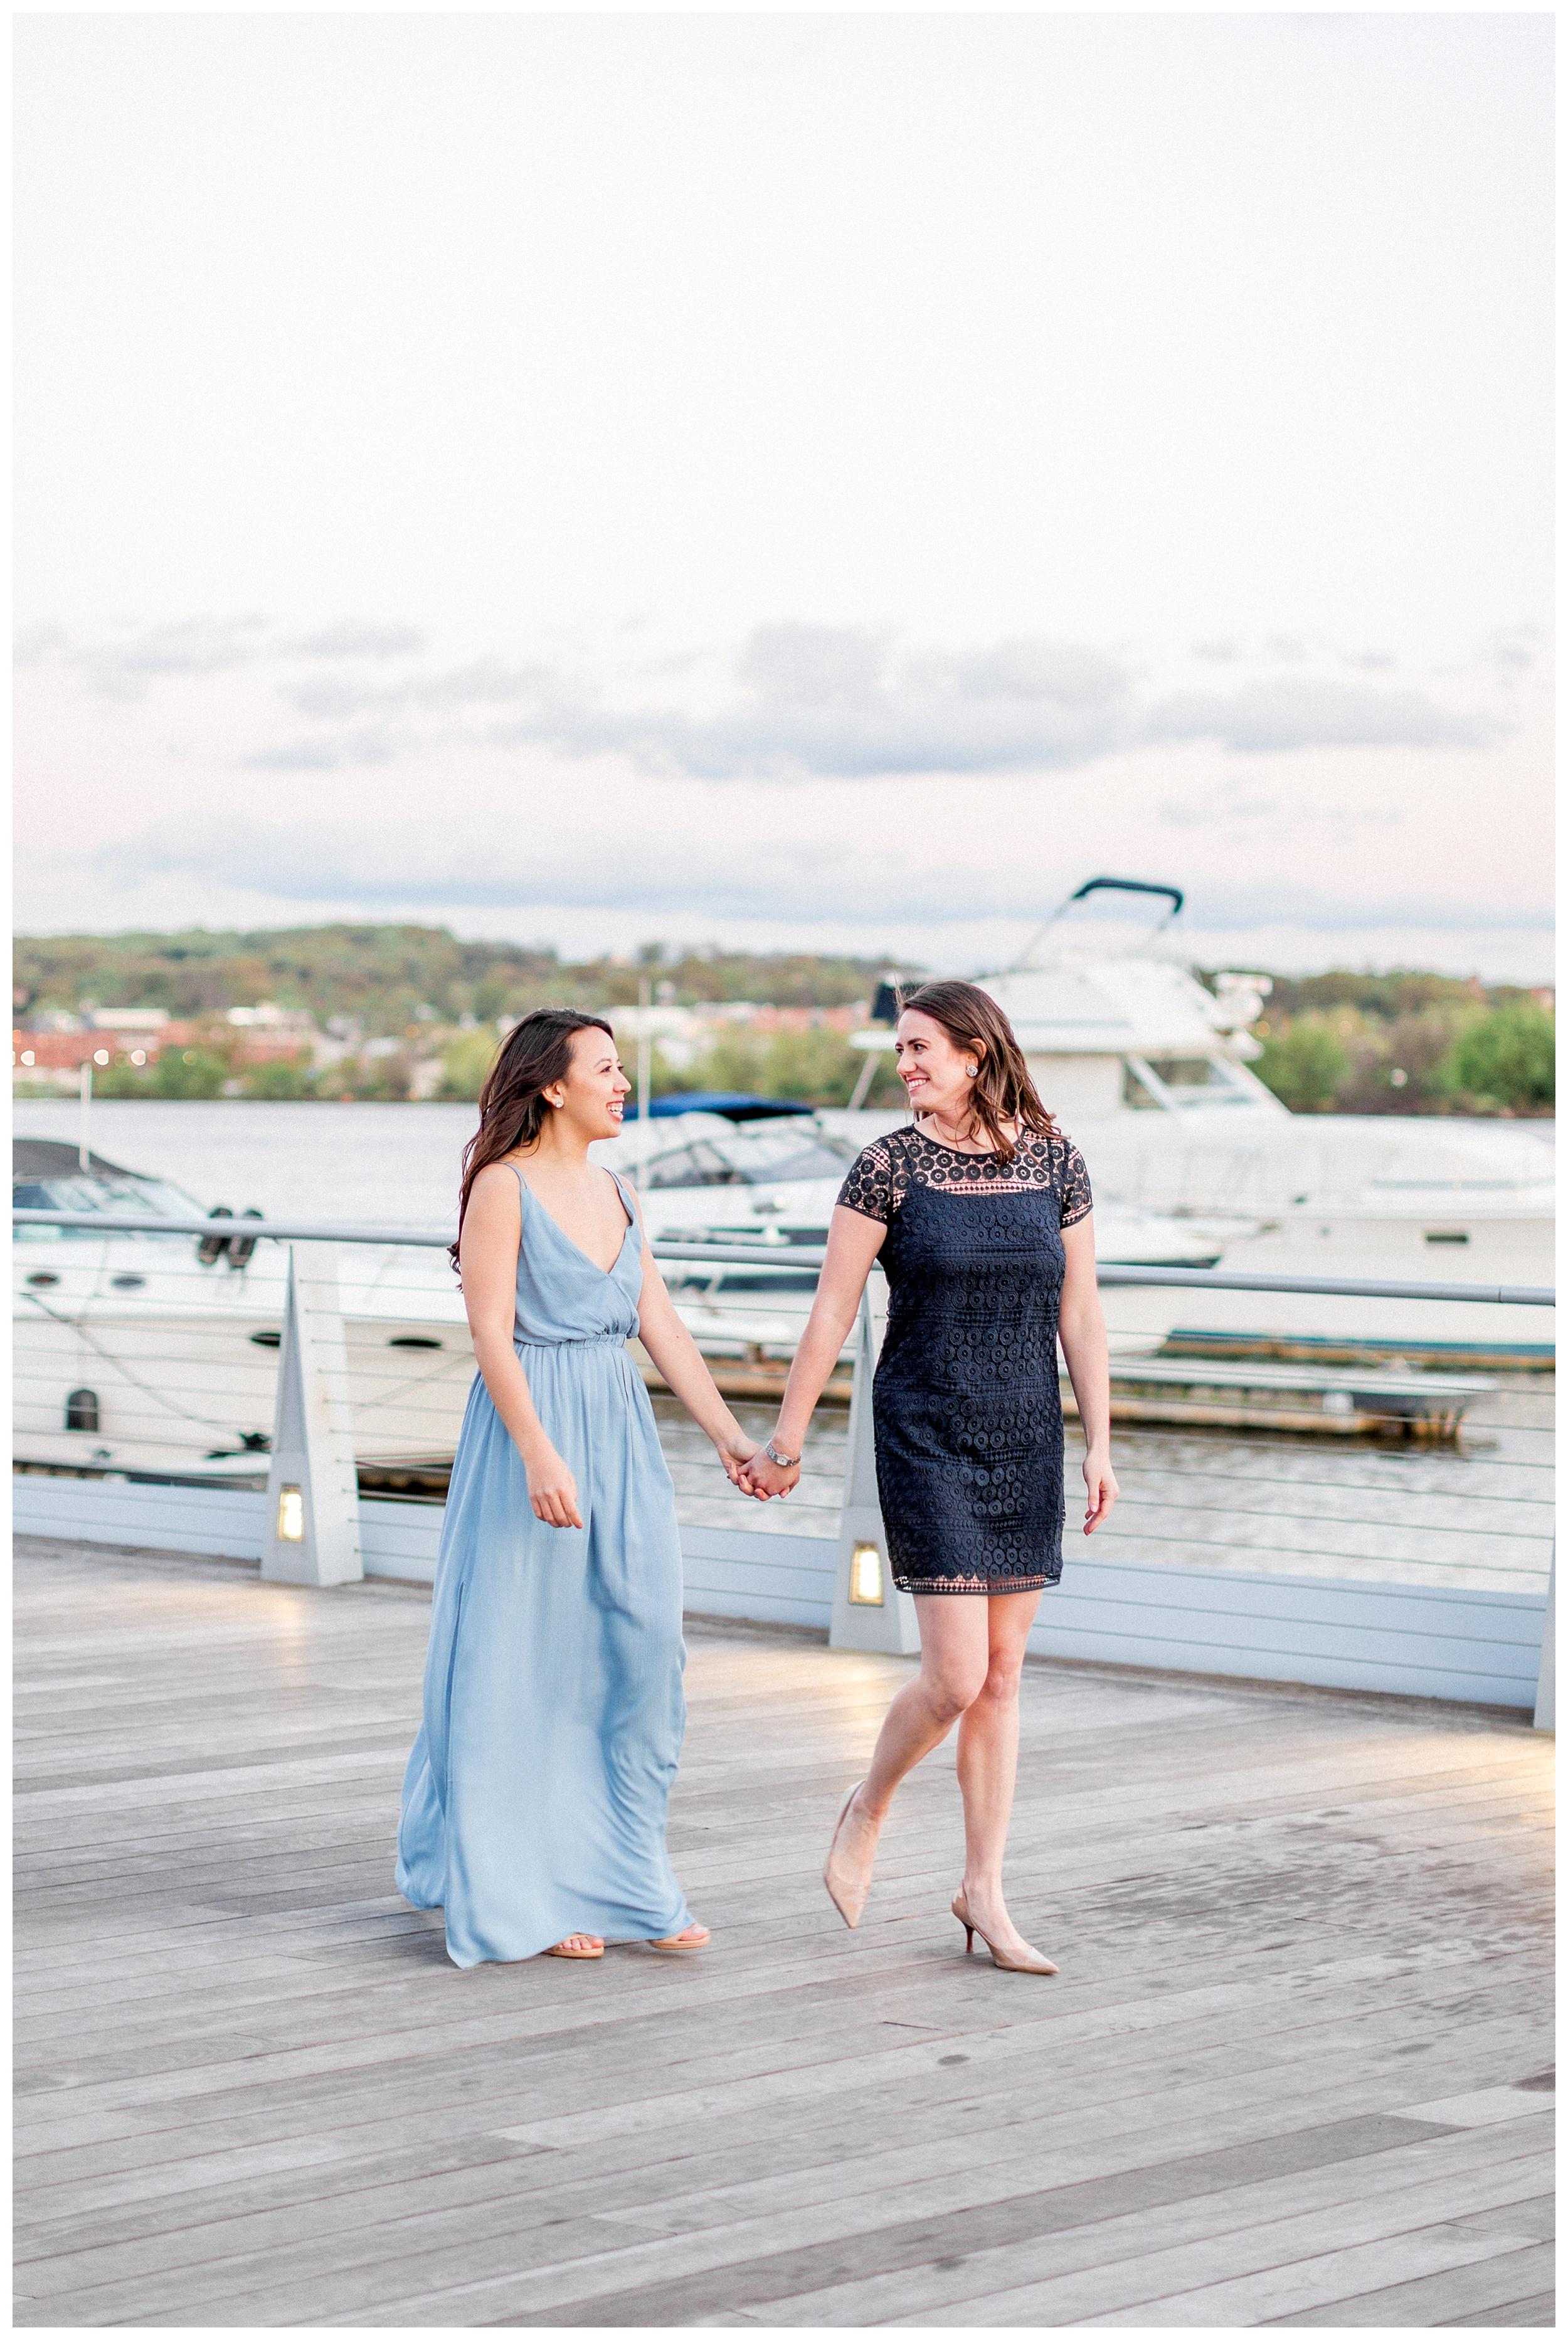 Same Sex DC Engagement | District of Columbia Wedding Photographer Kir Tuben_0035.jpg